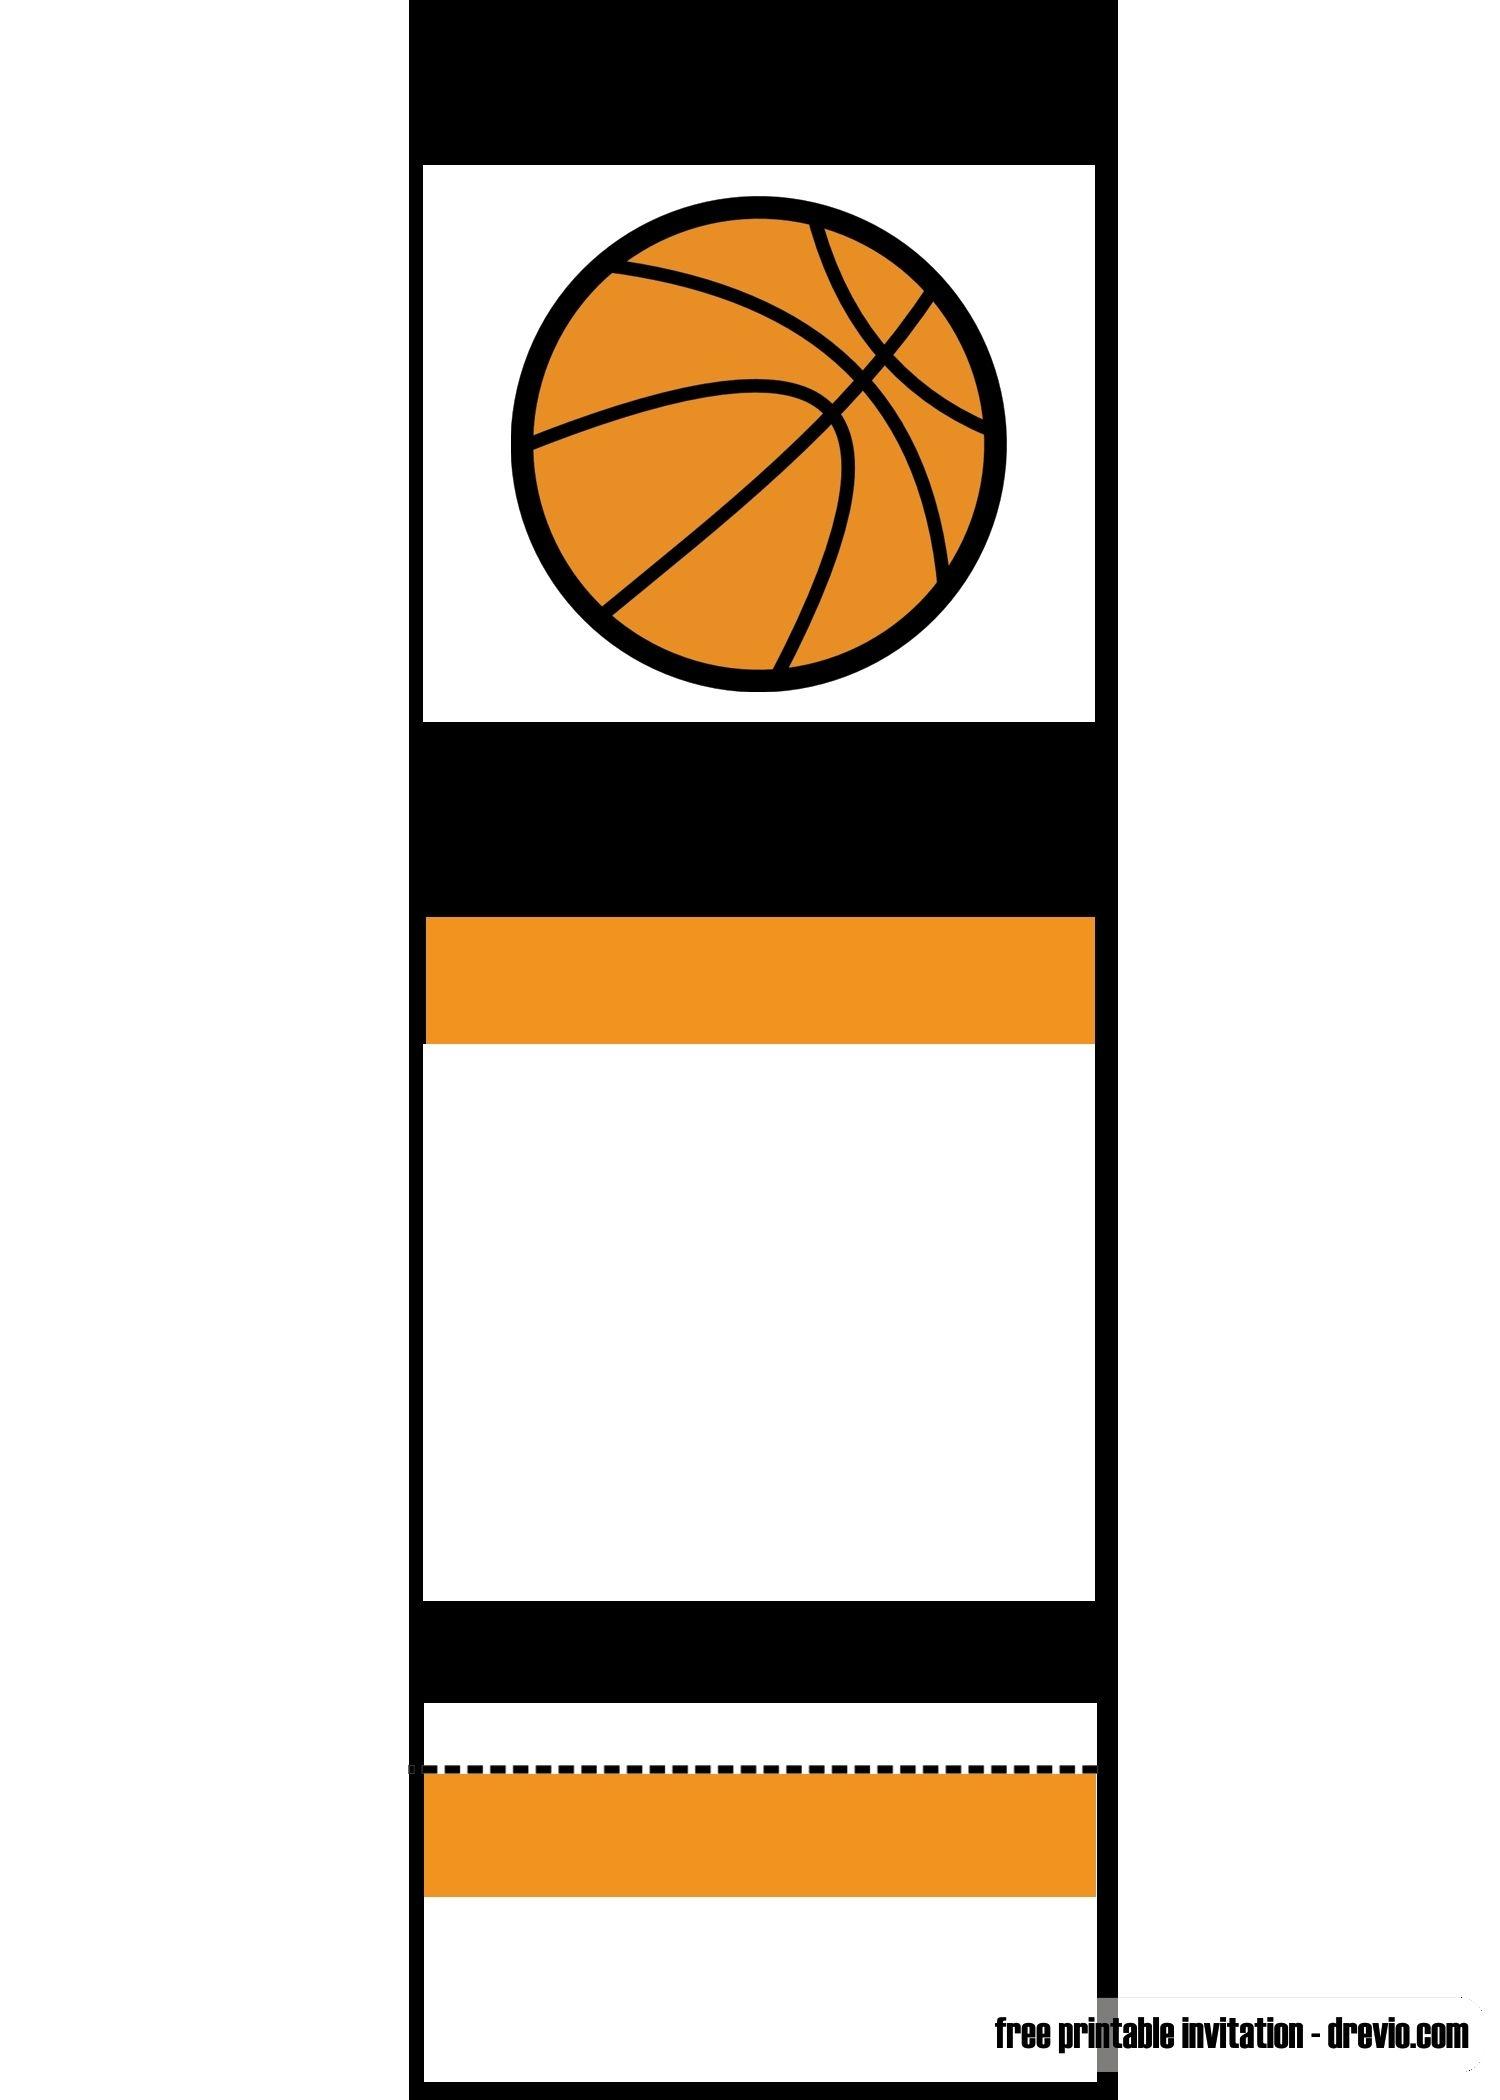 Free Printable Basketball Ticket Invitation Unc Vs Gonzaga